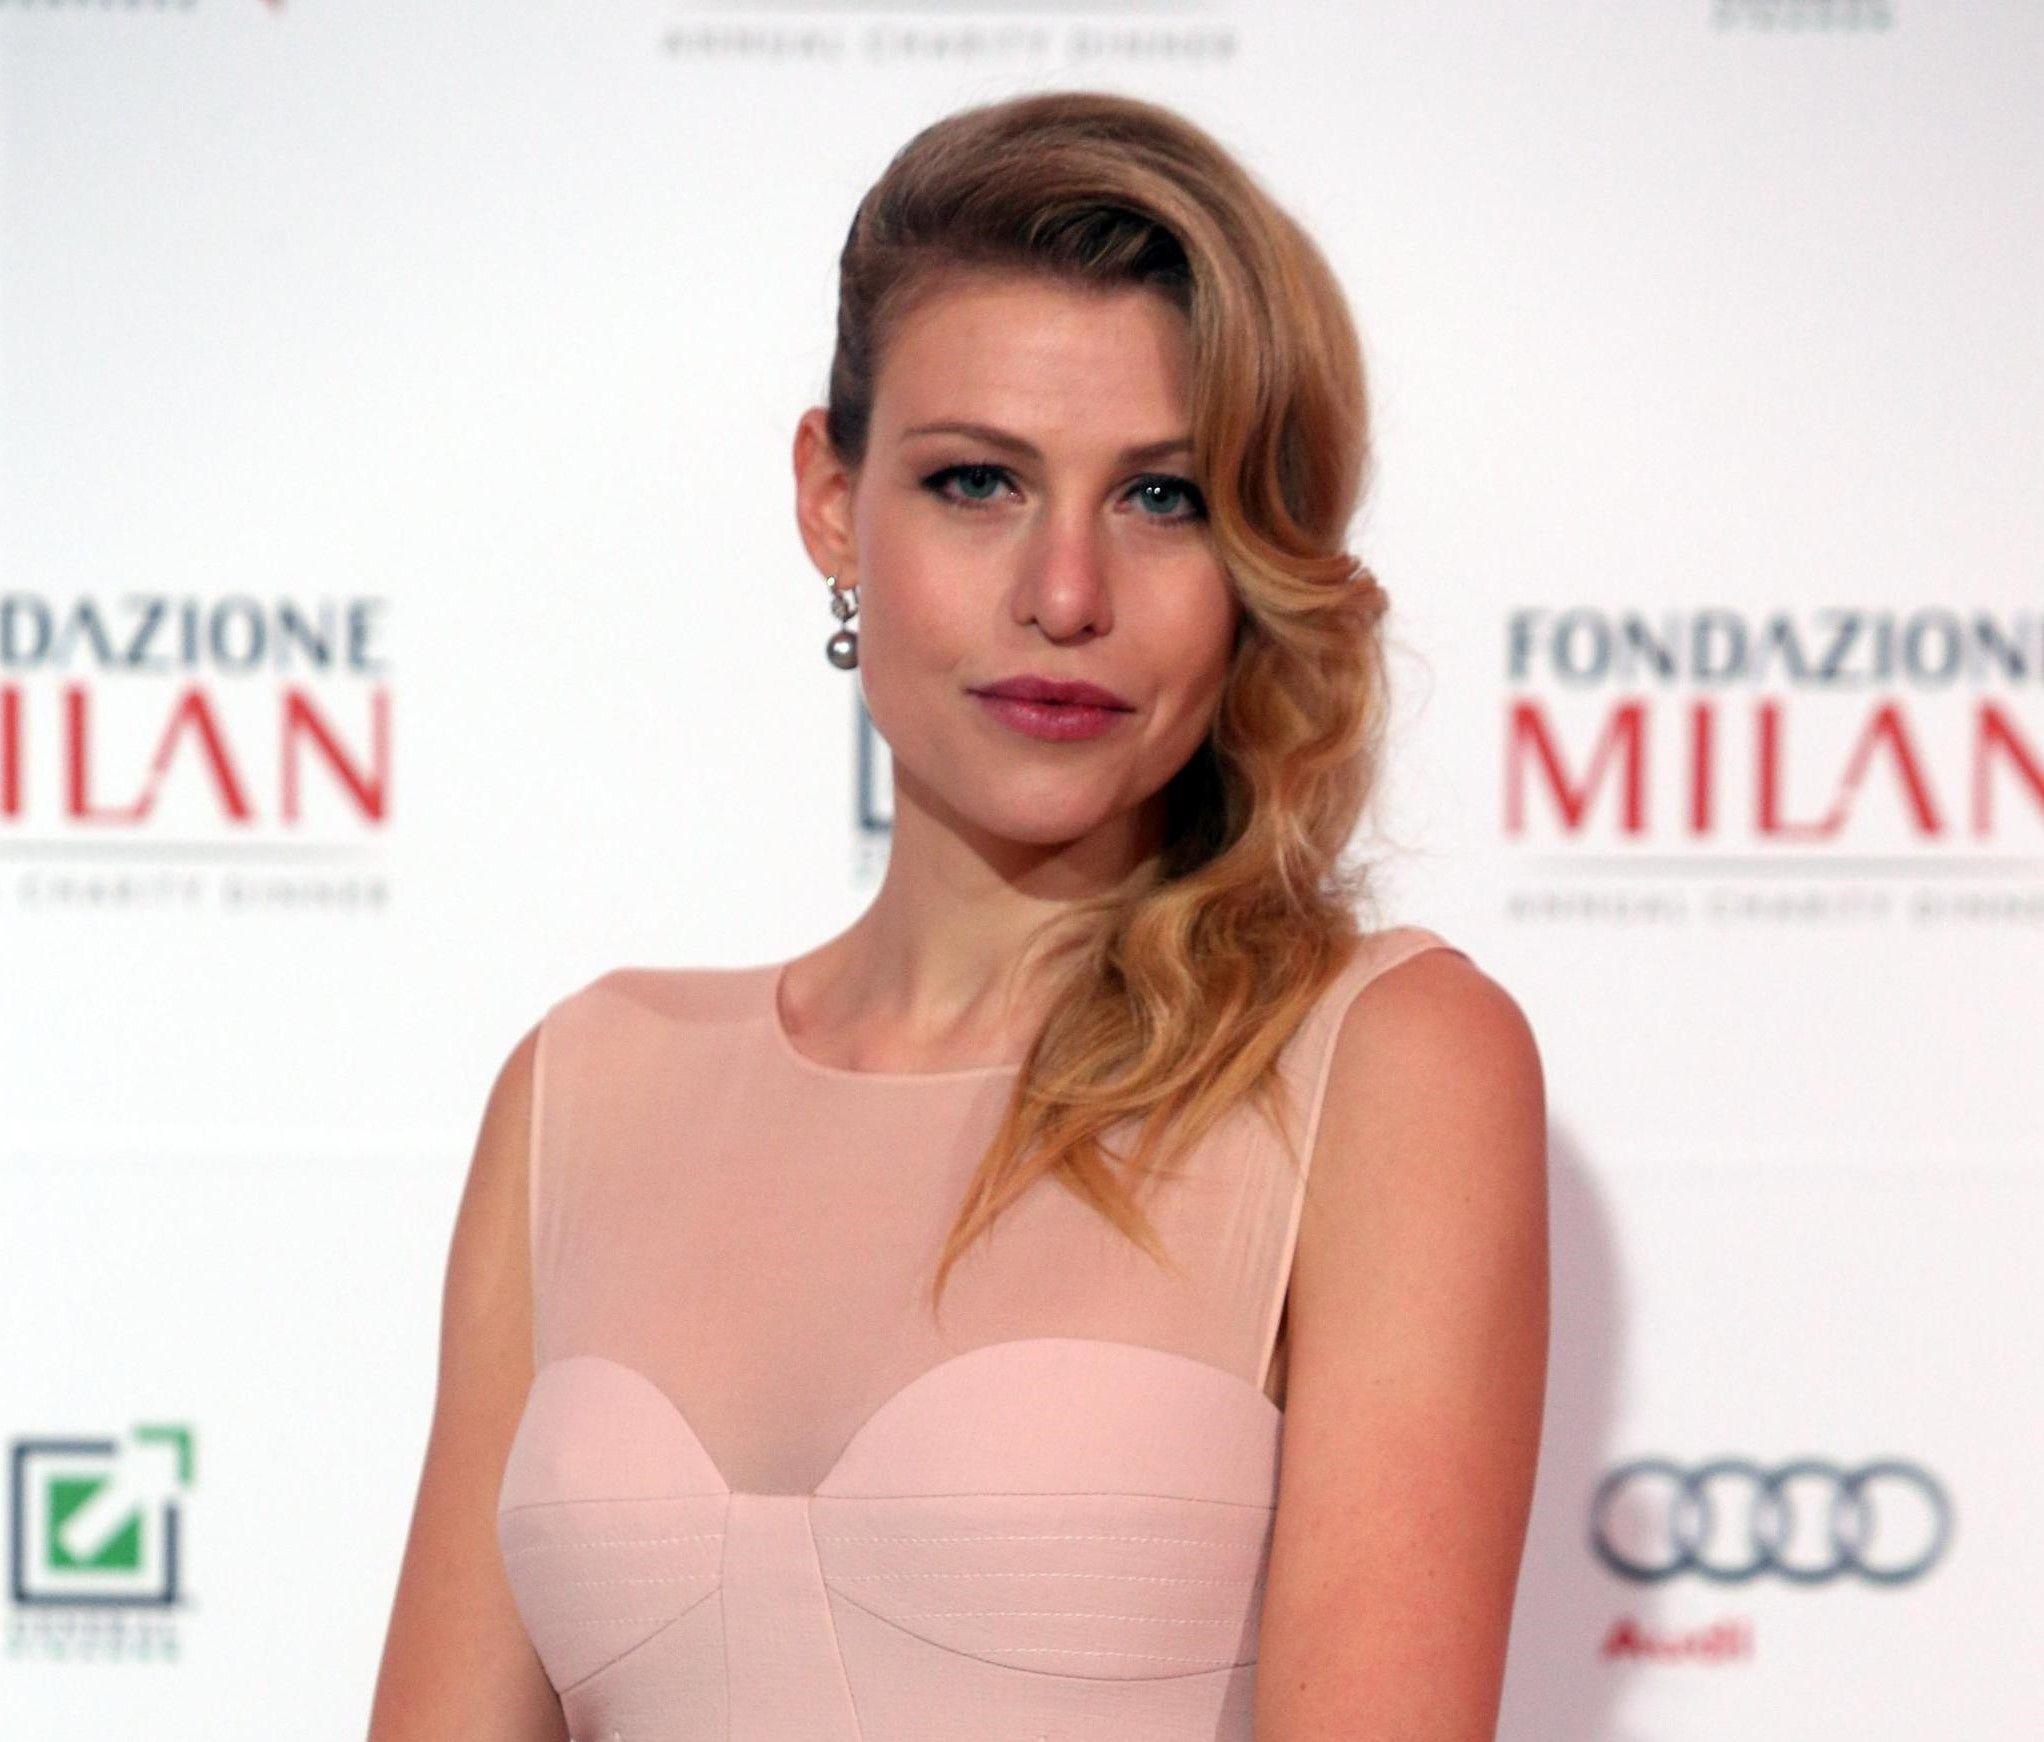 Annual Charity Dinner of Fondazione Milan